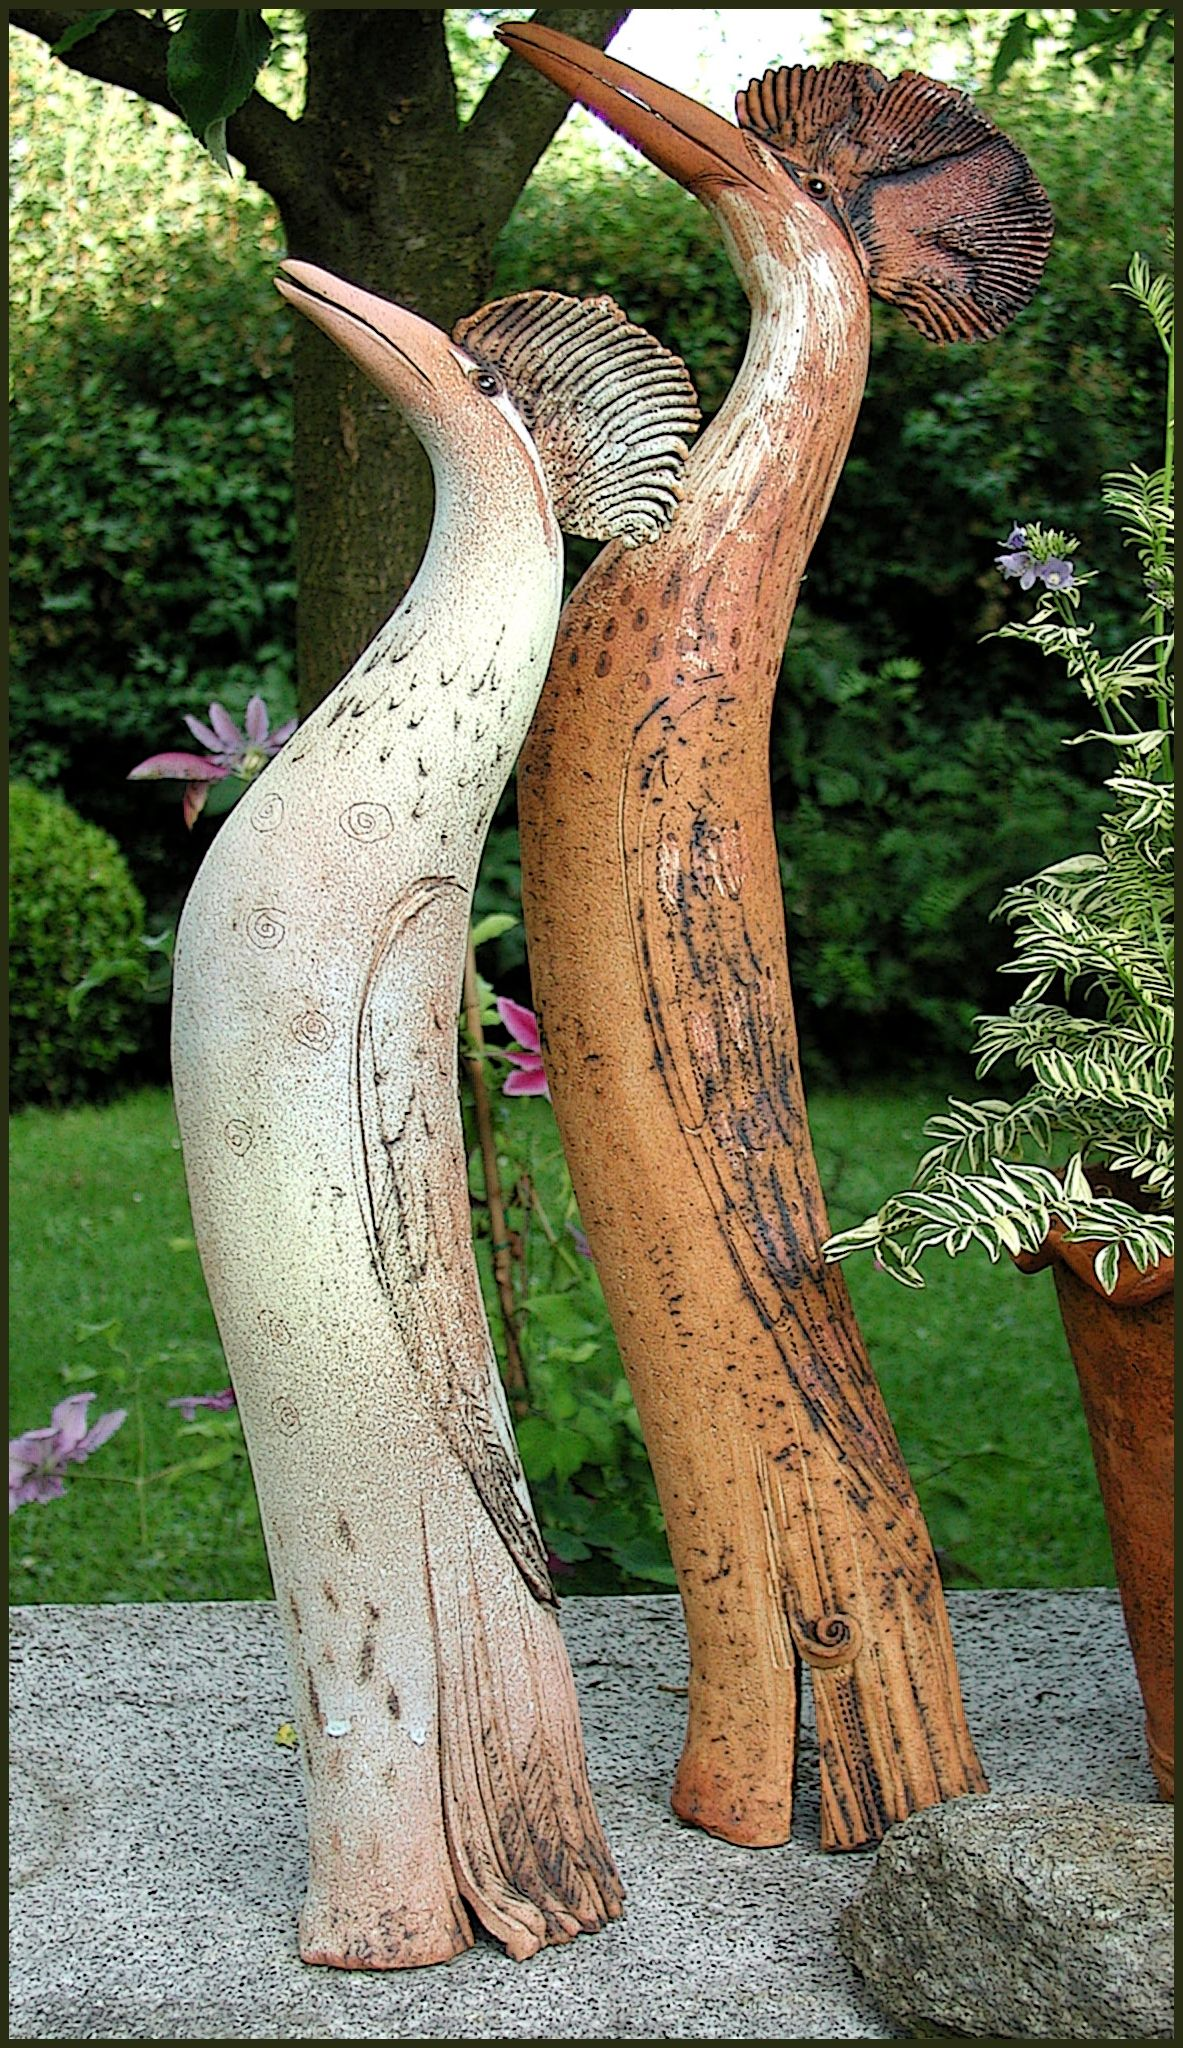 V gel 2001 1 pottery handbuilding pinterest vogel keramik und keramik ideen - Keramik ideen ...